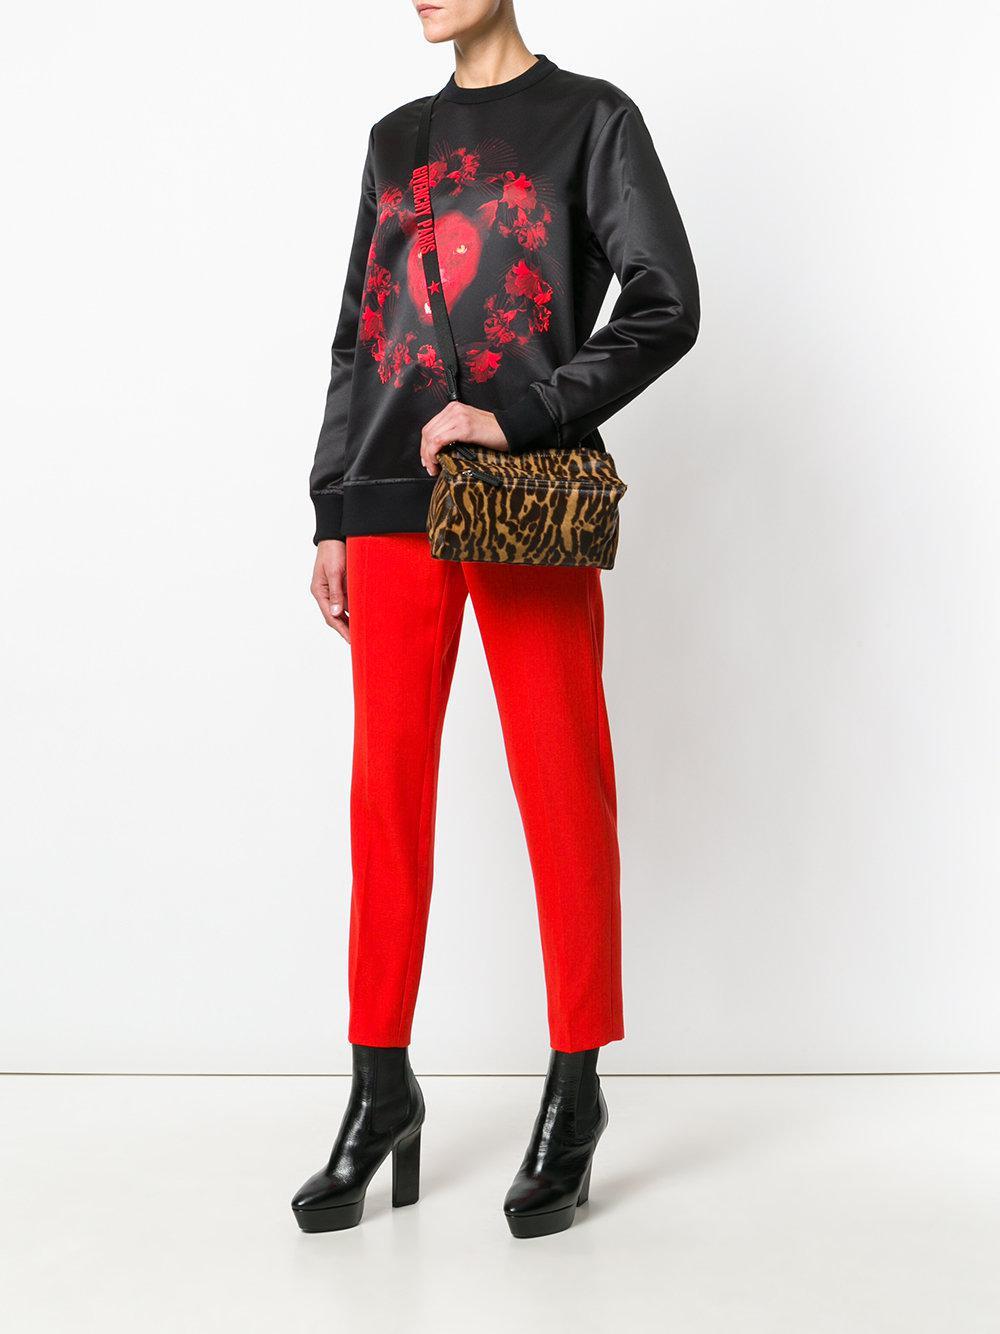 Lyst - Givenchy Leopard Print Pandora Mini Bag in Brown e85bce9d2daf3